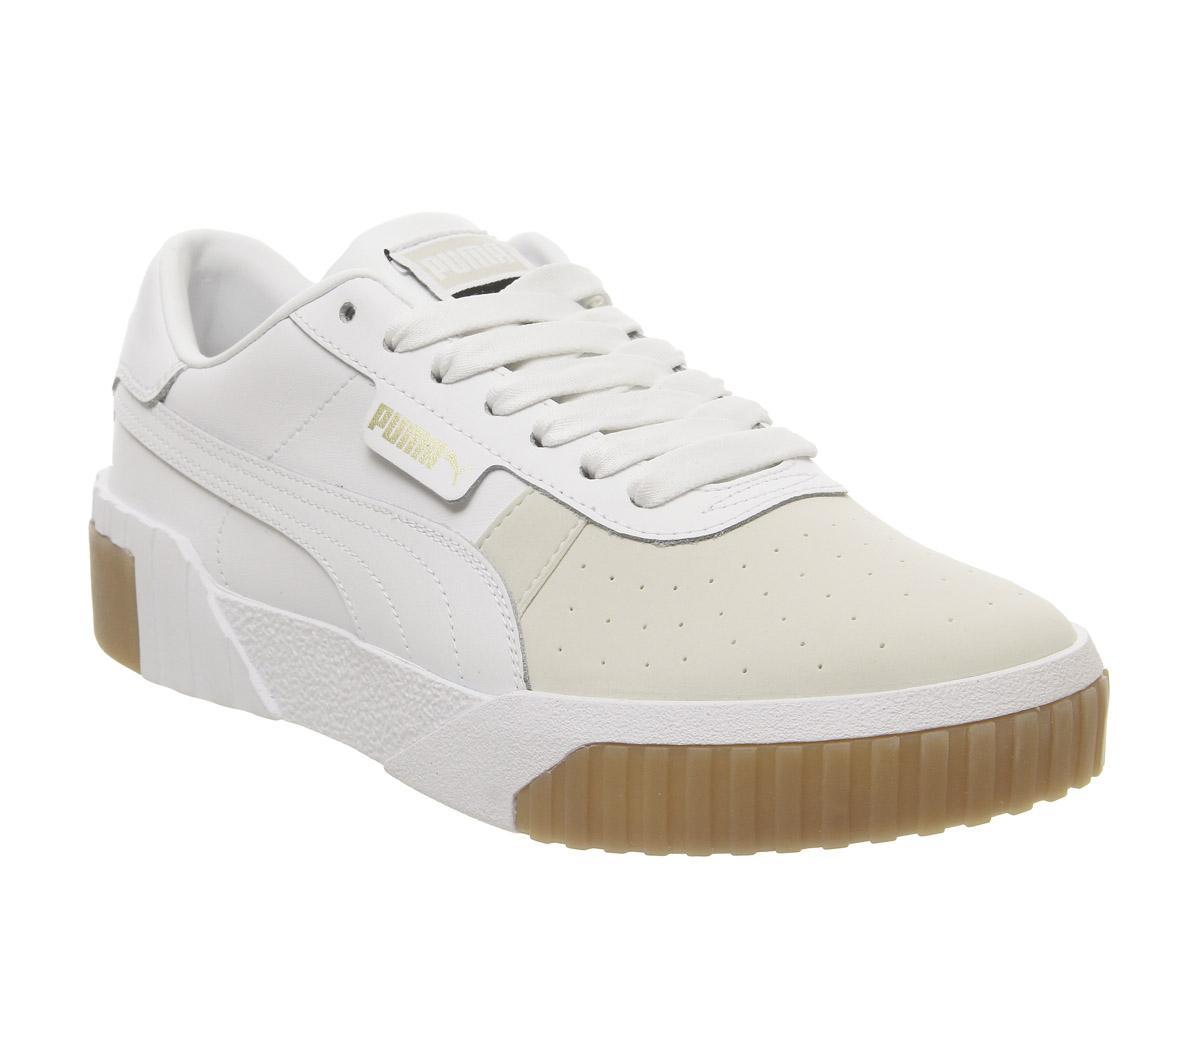 Puma Cali Trainers Puma White Gum White